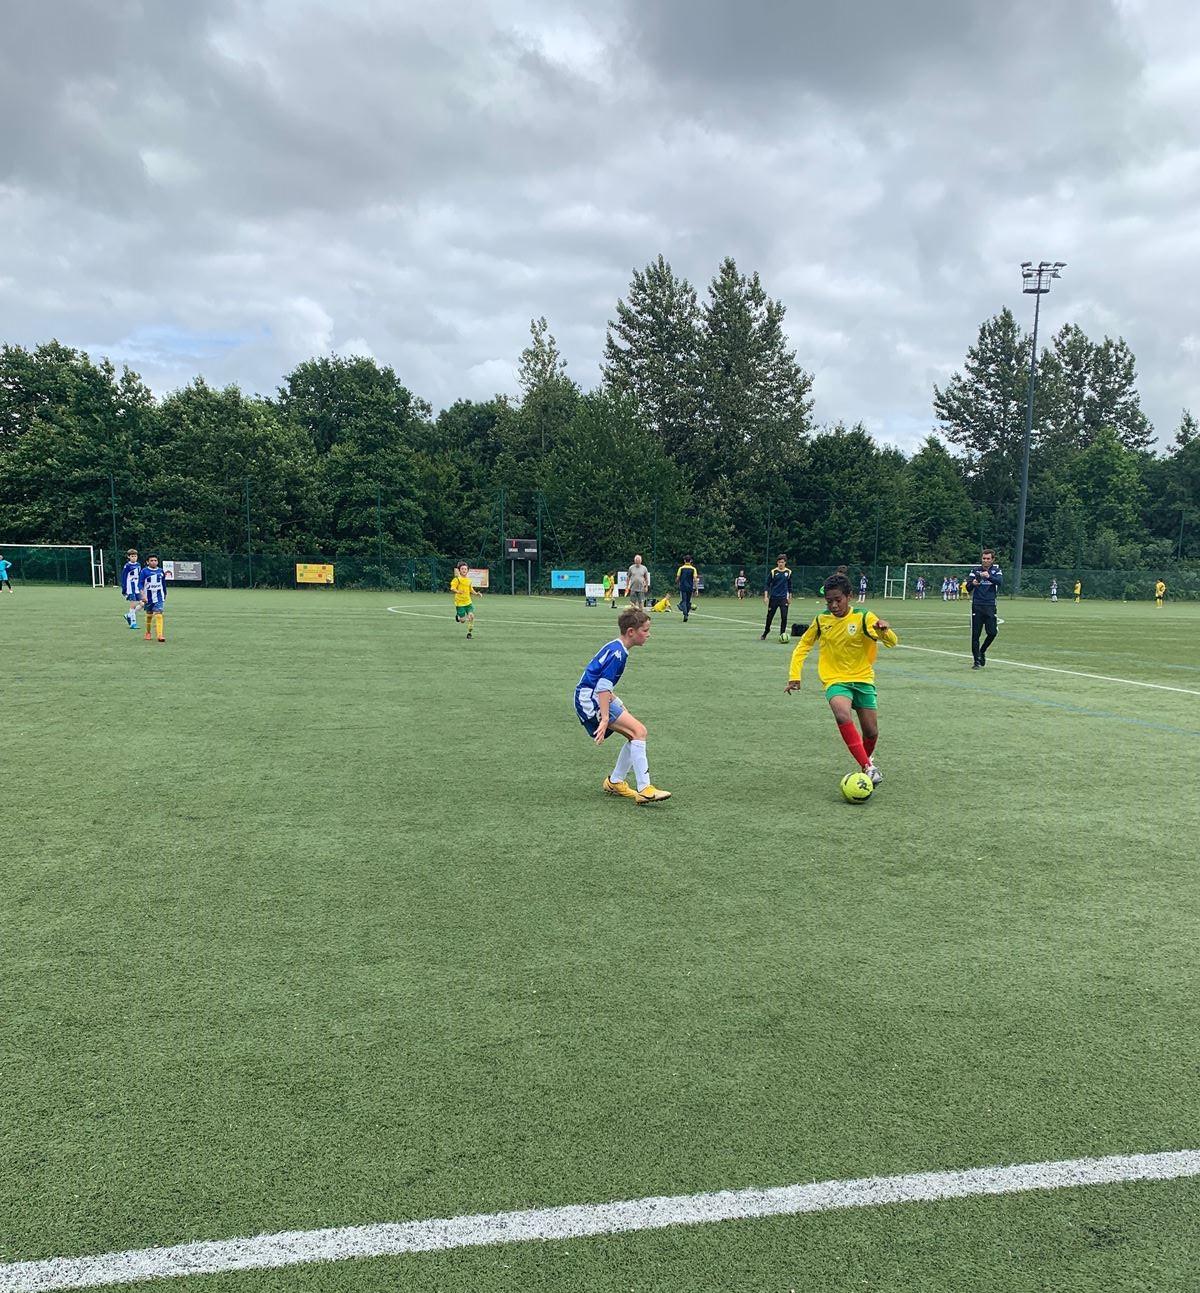 Photos matches des U12 SFT vs U12 SHOC samedi 3 juillet 2021!